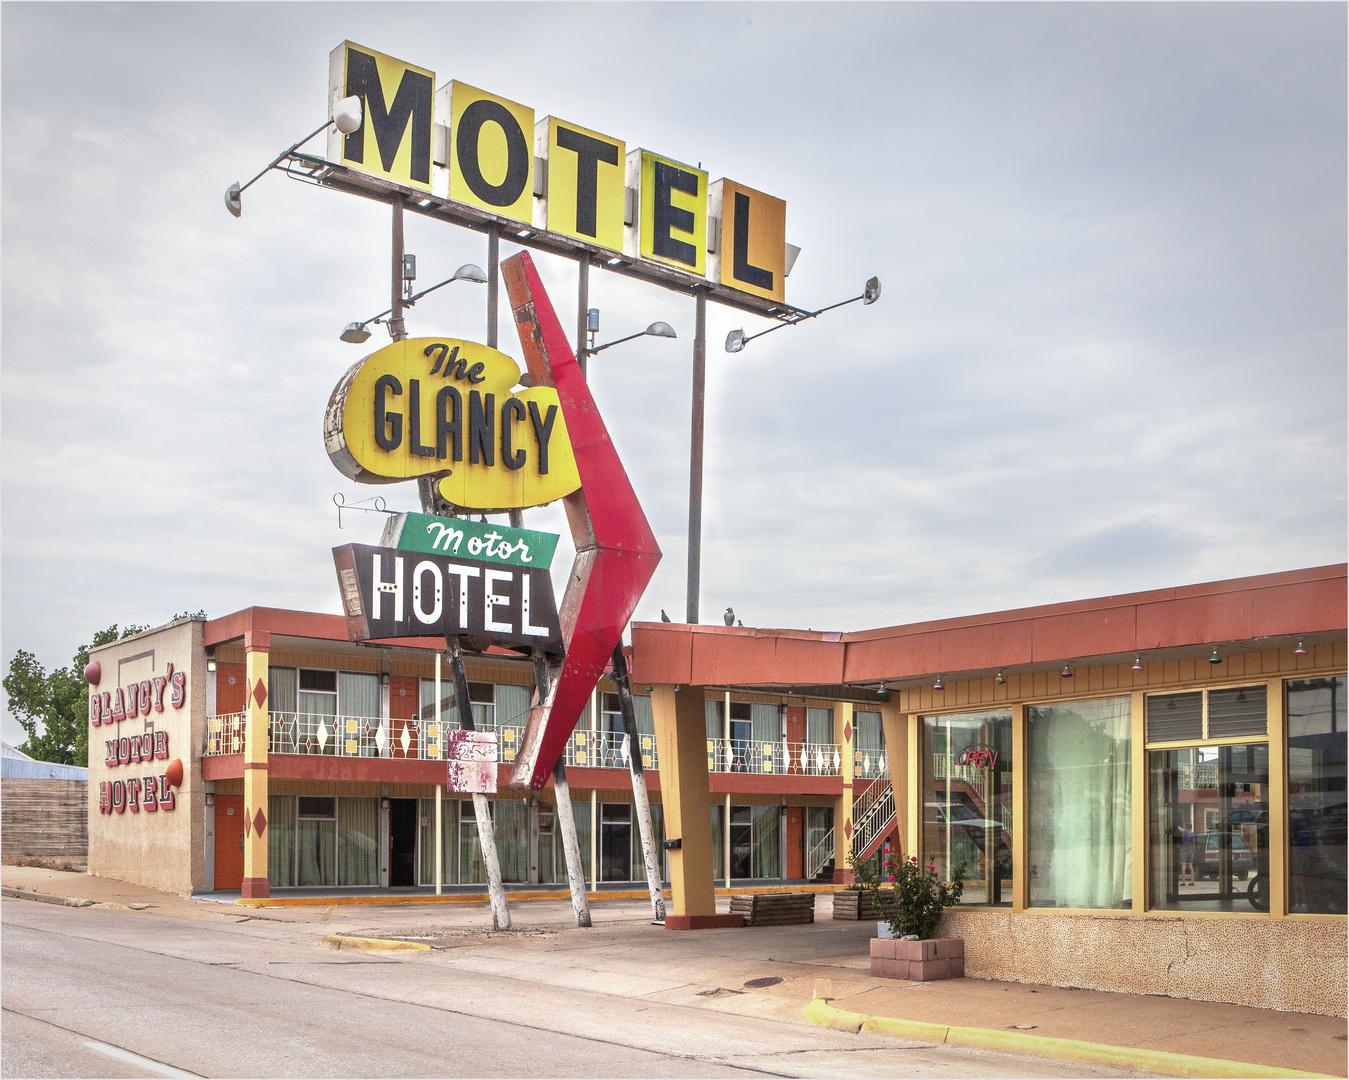 The Glancy Motor Hotel